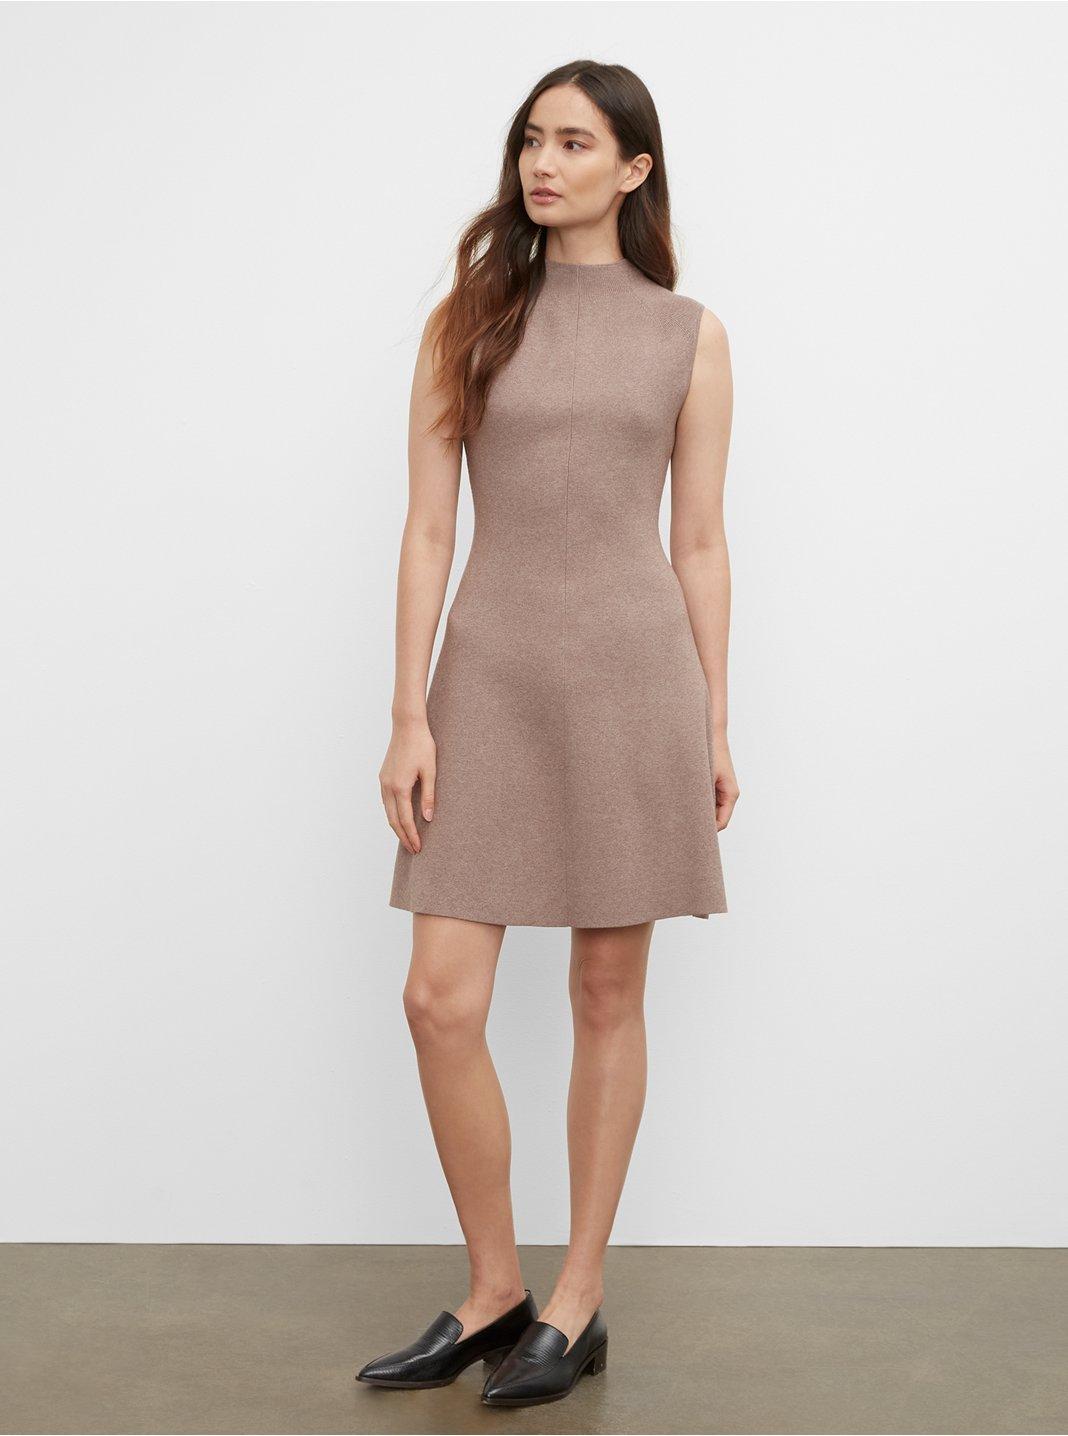 Kaytee Dress